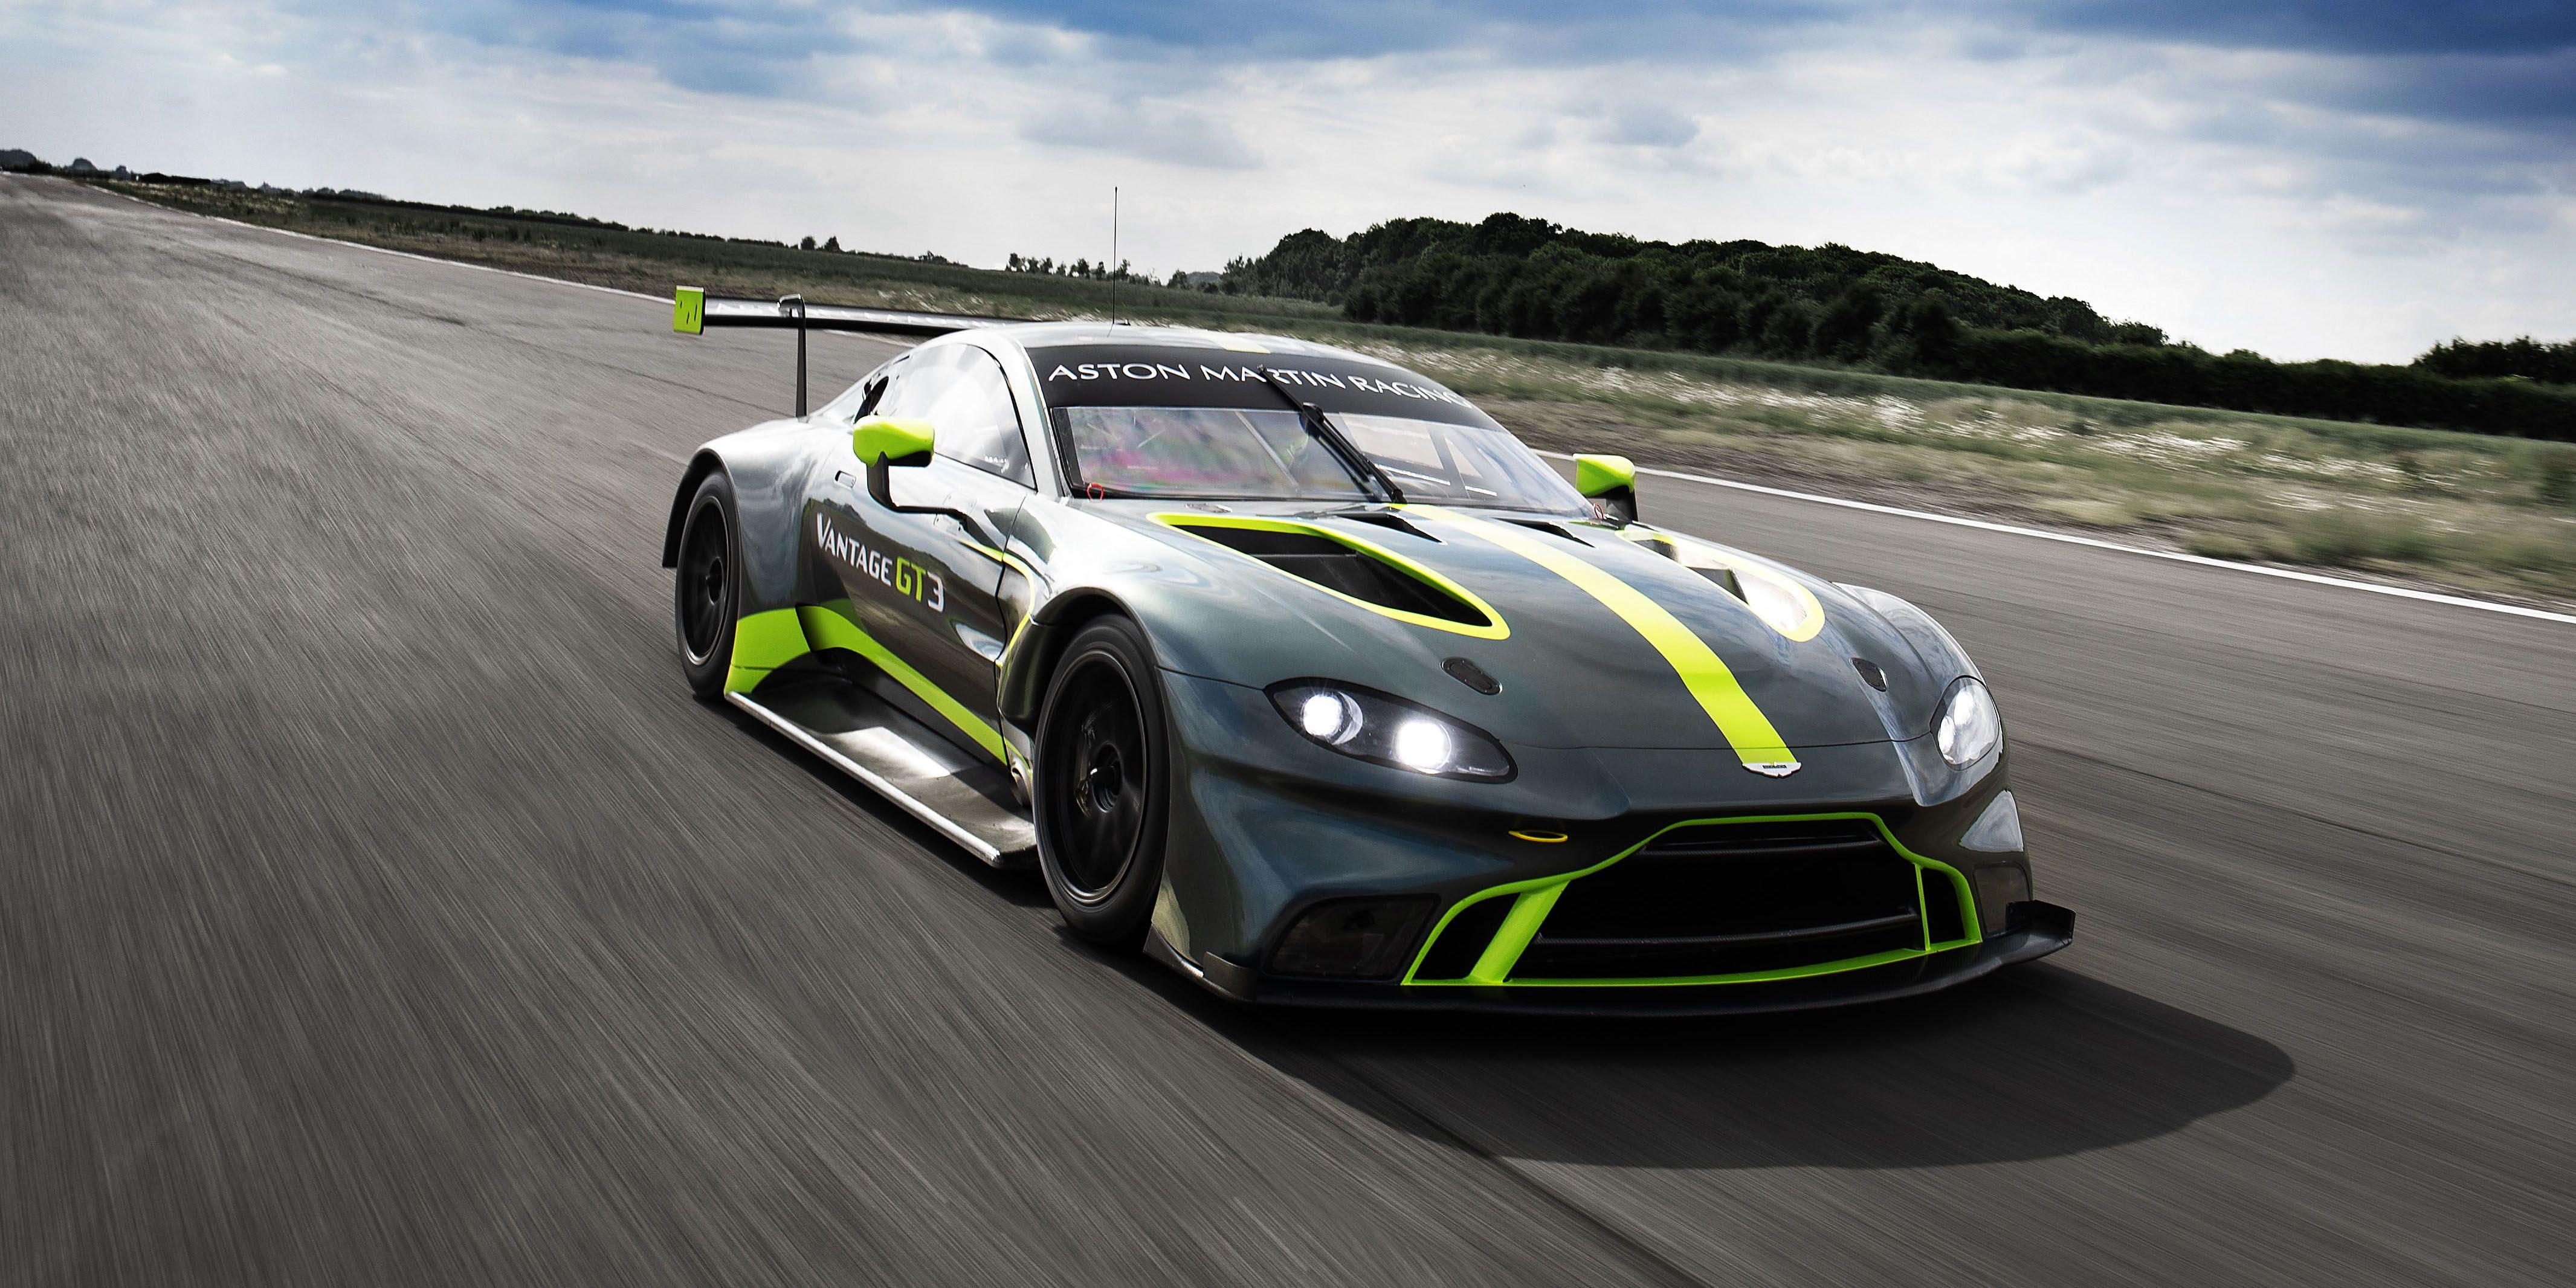 No Surprise Aston Martin S New Race Cars Are Wonderful